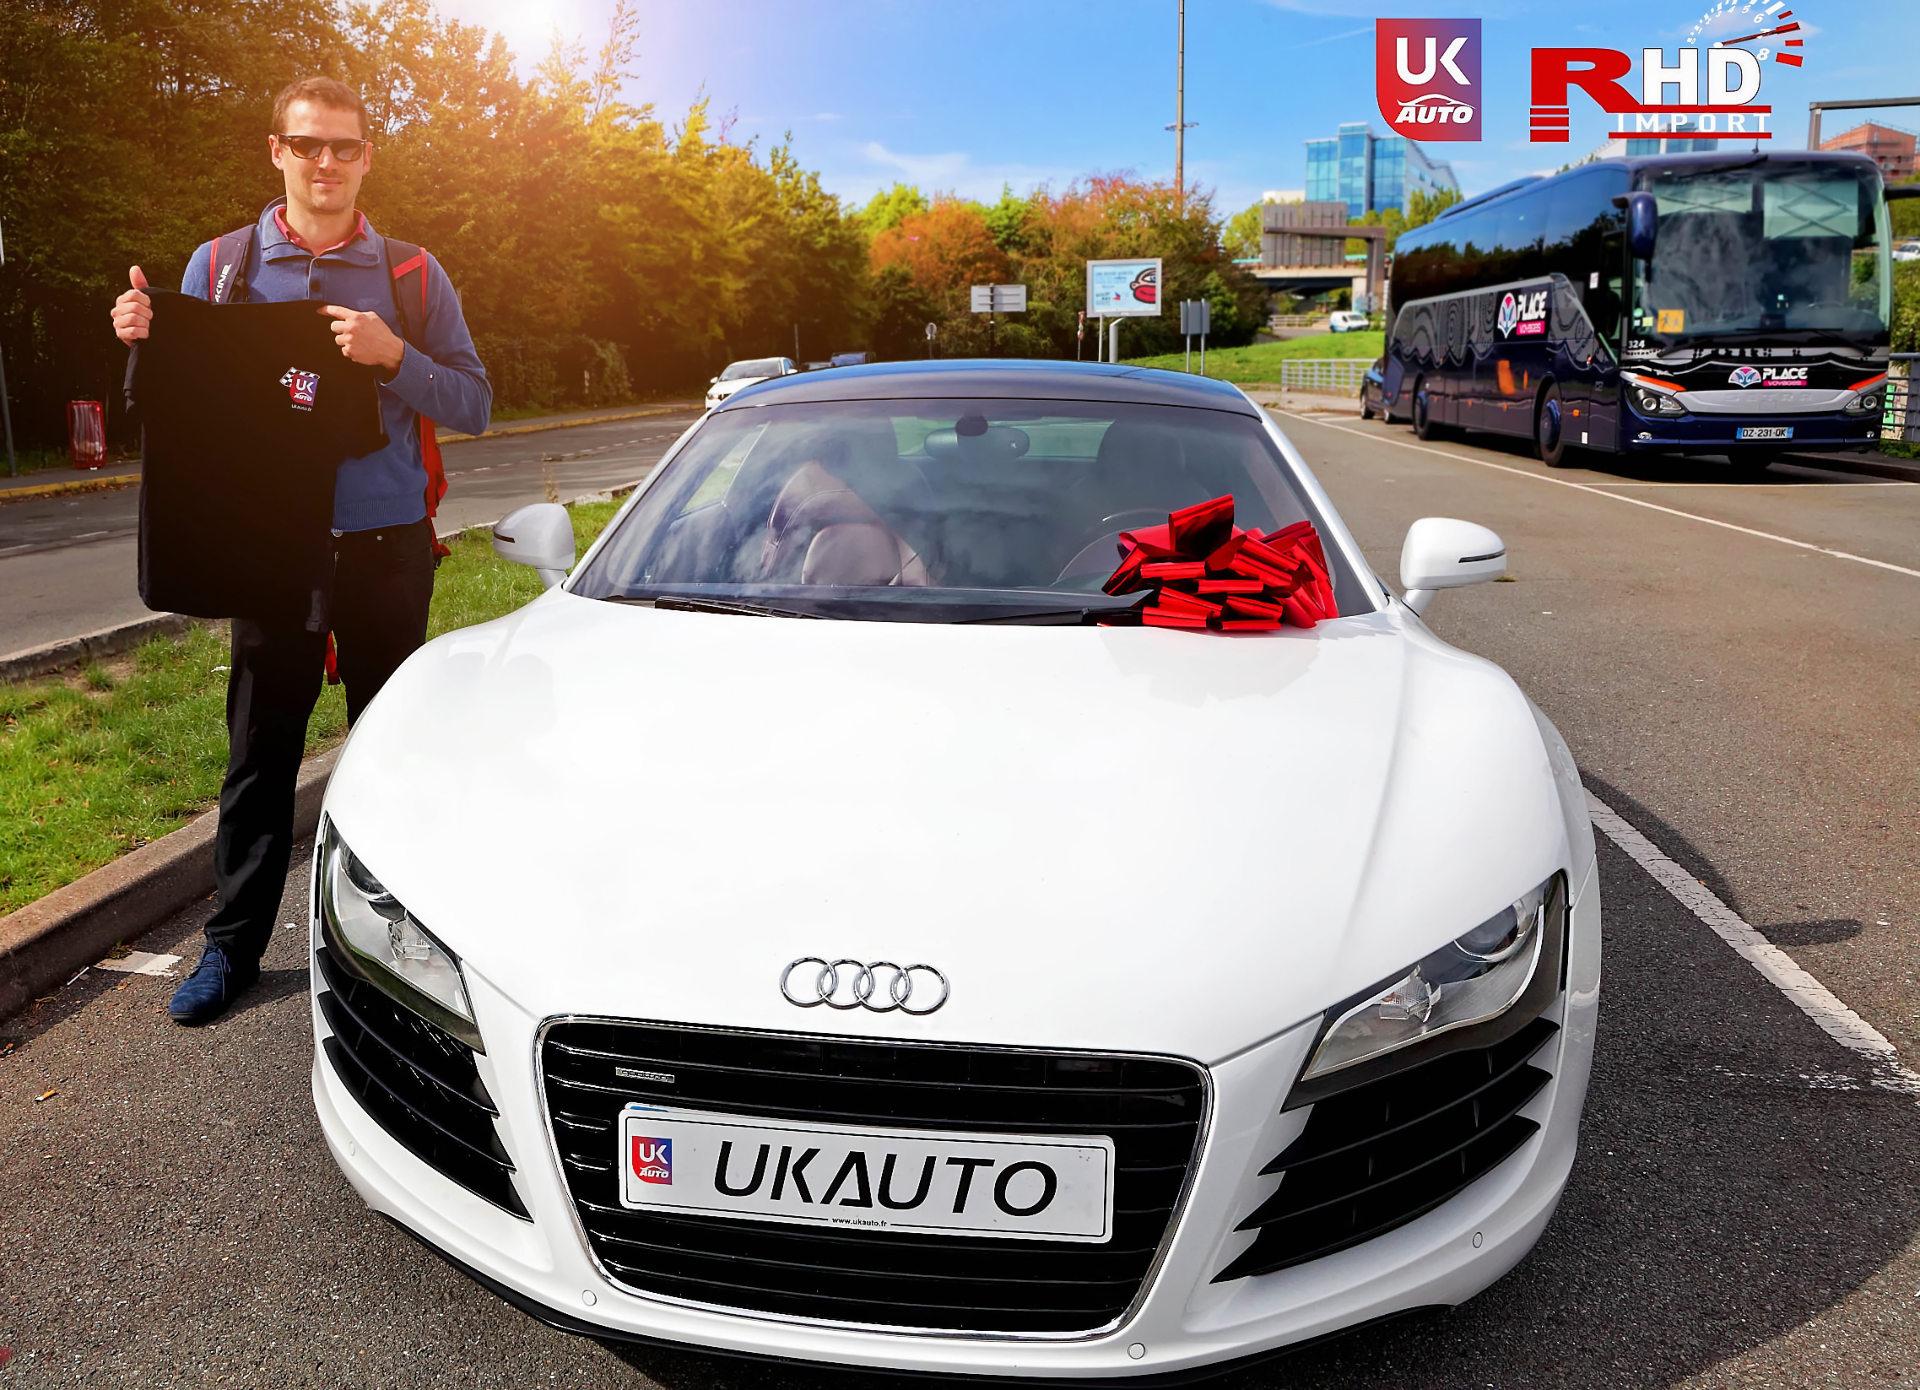 Audi R8 Import audi r8 lhd angleterre audi R8 V8 TFSI AUDI uk importation audi LHD volant a gauche2 DxO - AUDI R8 ANGLETERRE IMPORTATION AUDI R8 UK IMPORT SUPERCAR FELICITATION A CHARLES POUR CET IMPORT